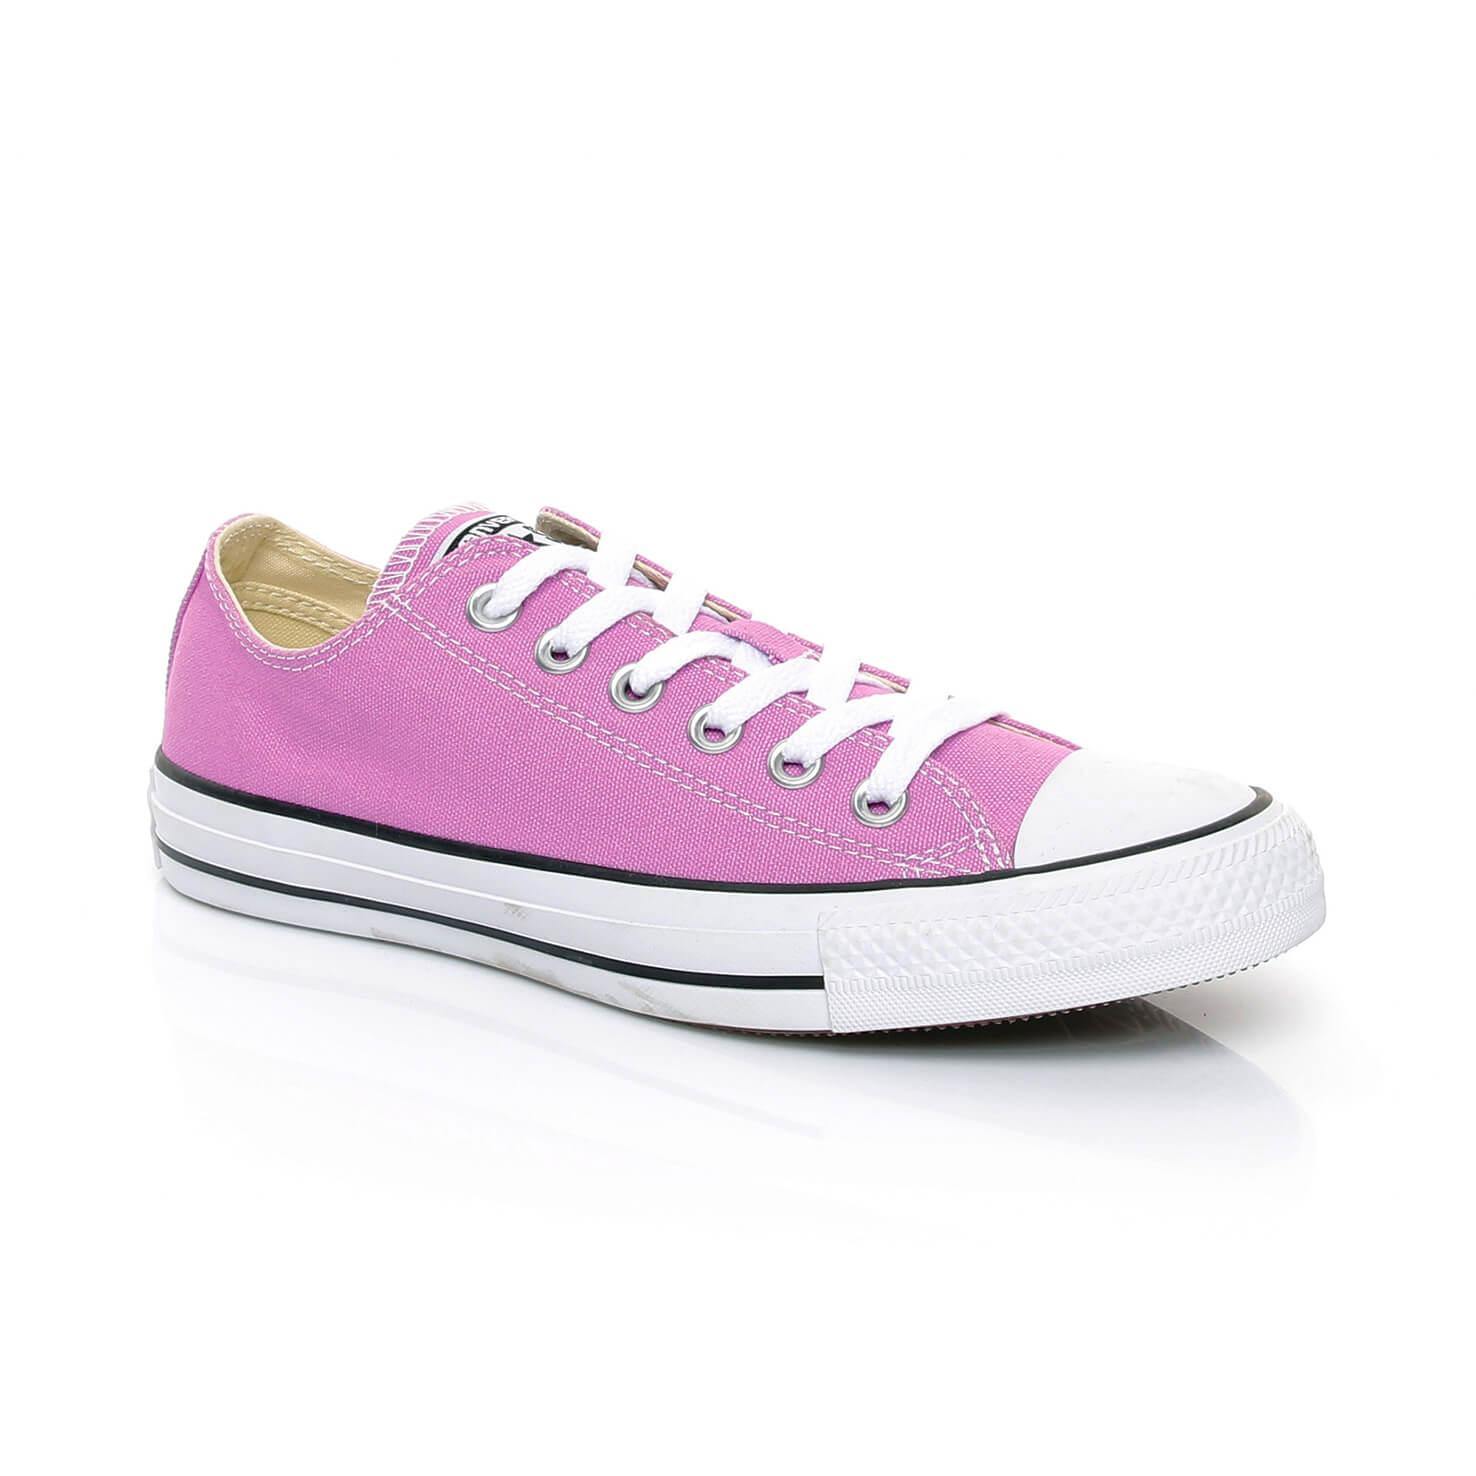 Converse Chuck Taylor All Star Unisex Pembe Sneaker